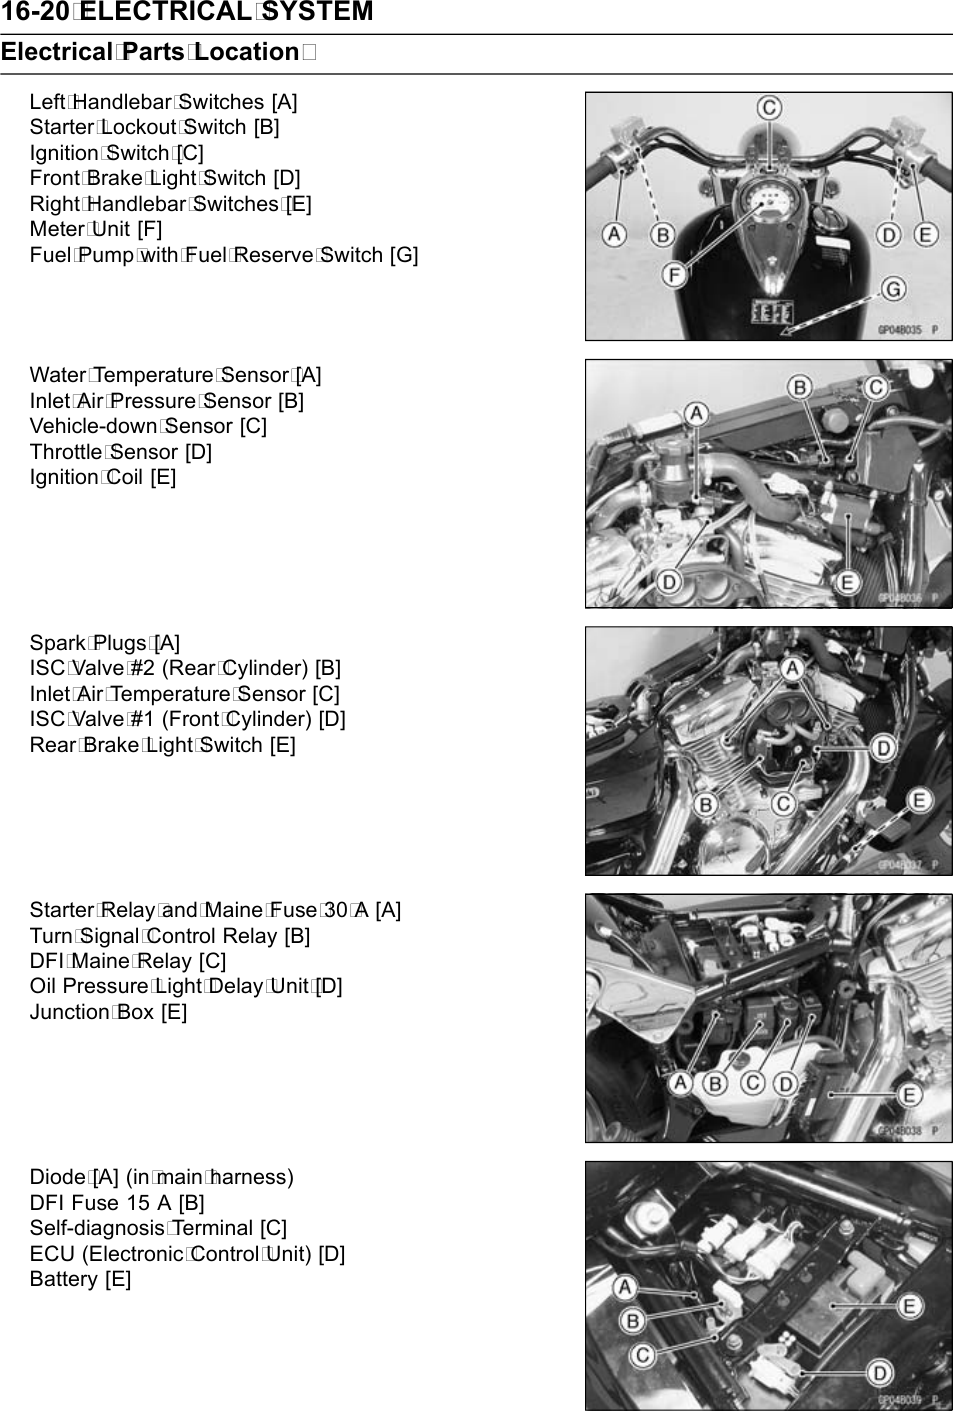 Kawasaki Vulcan 1600 Classic Service Manual ManualsLib Makes It Easy